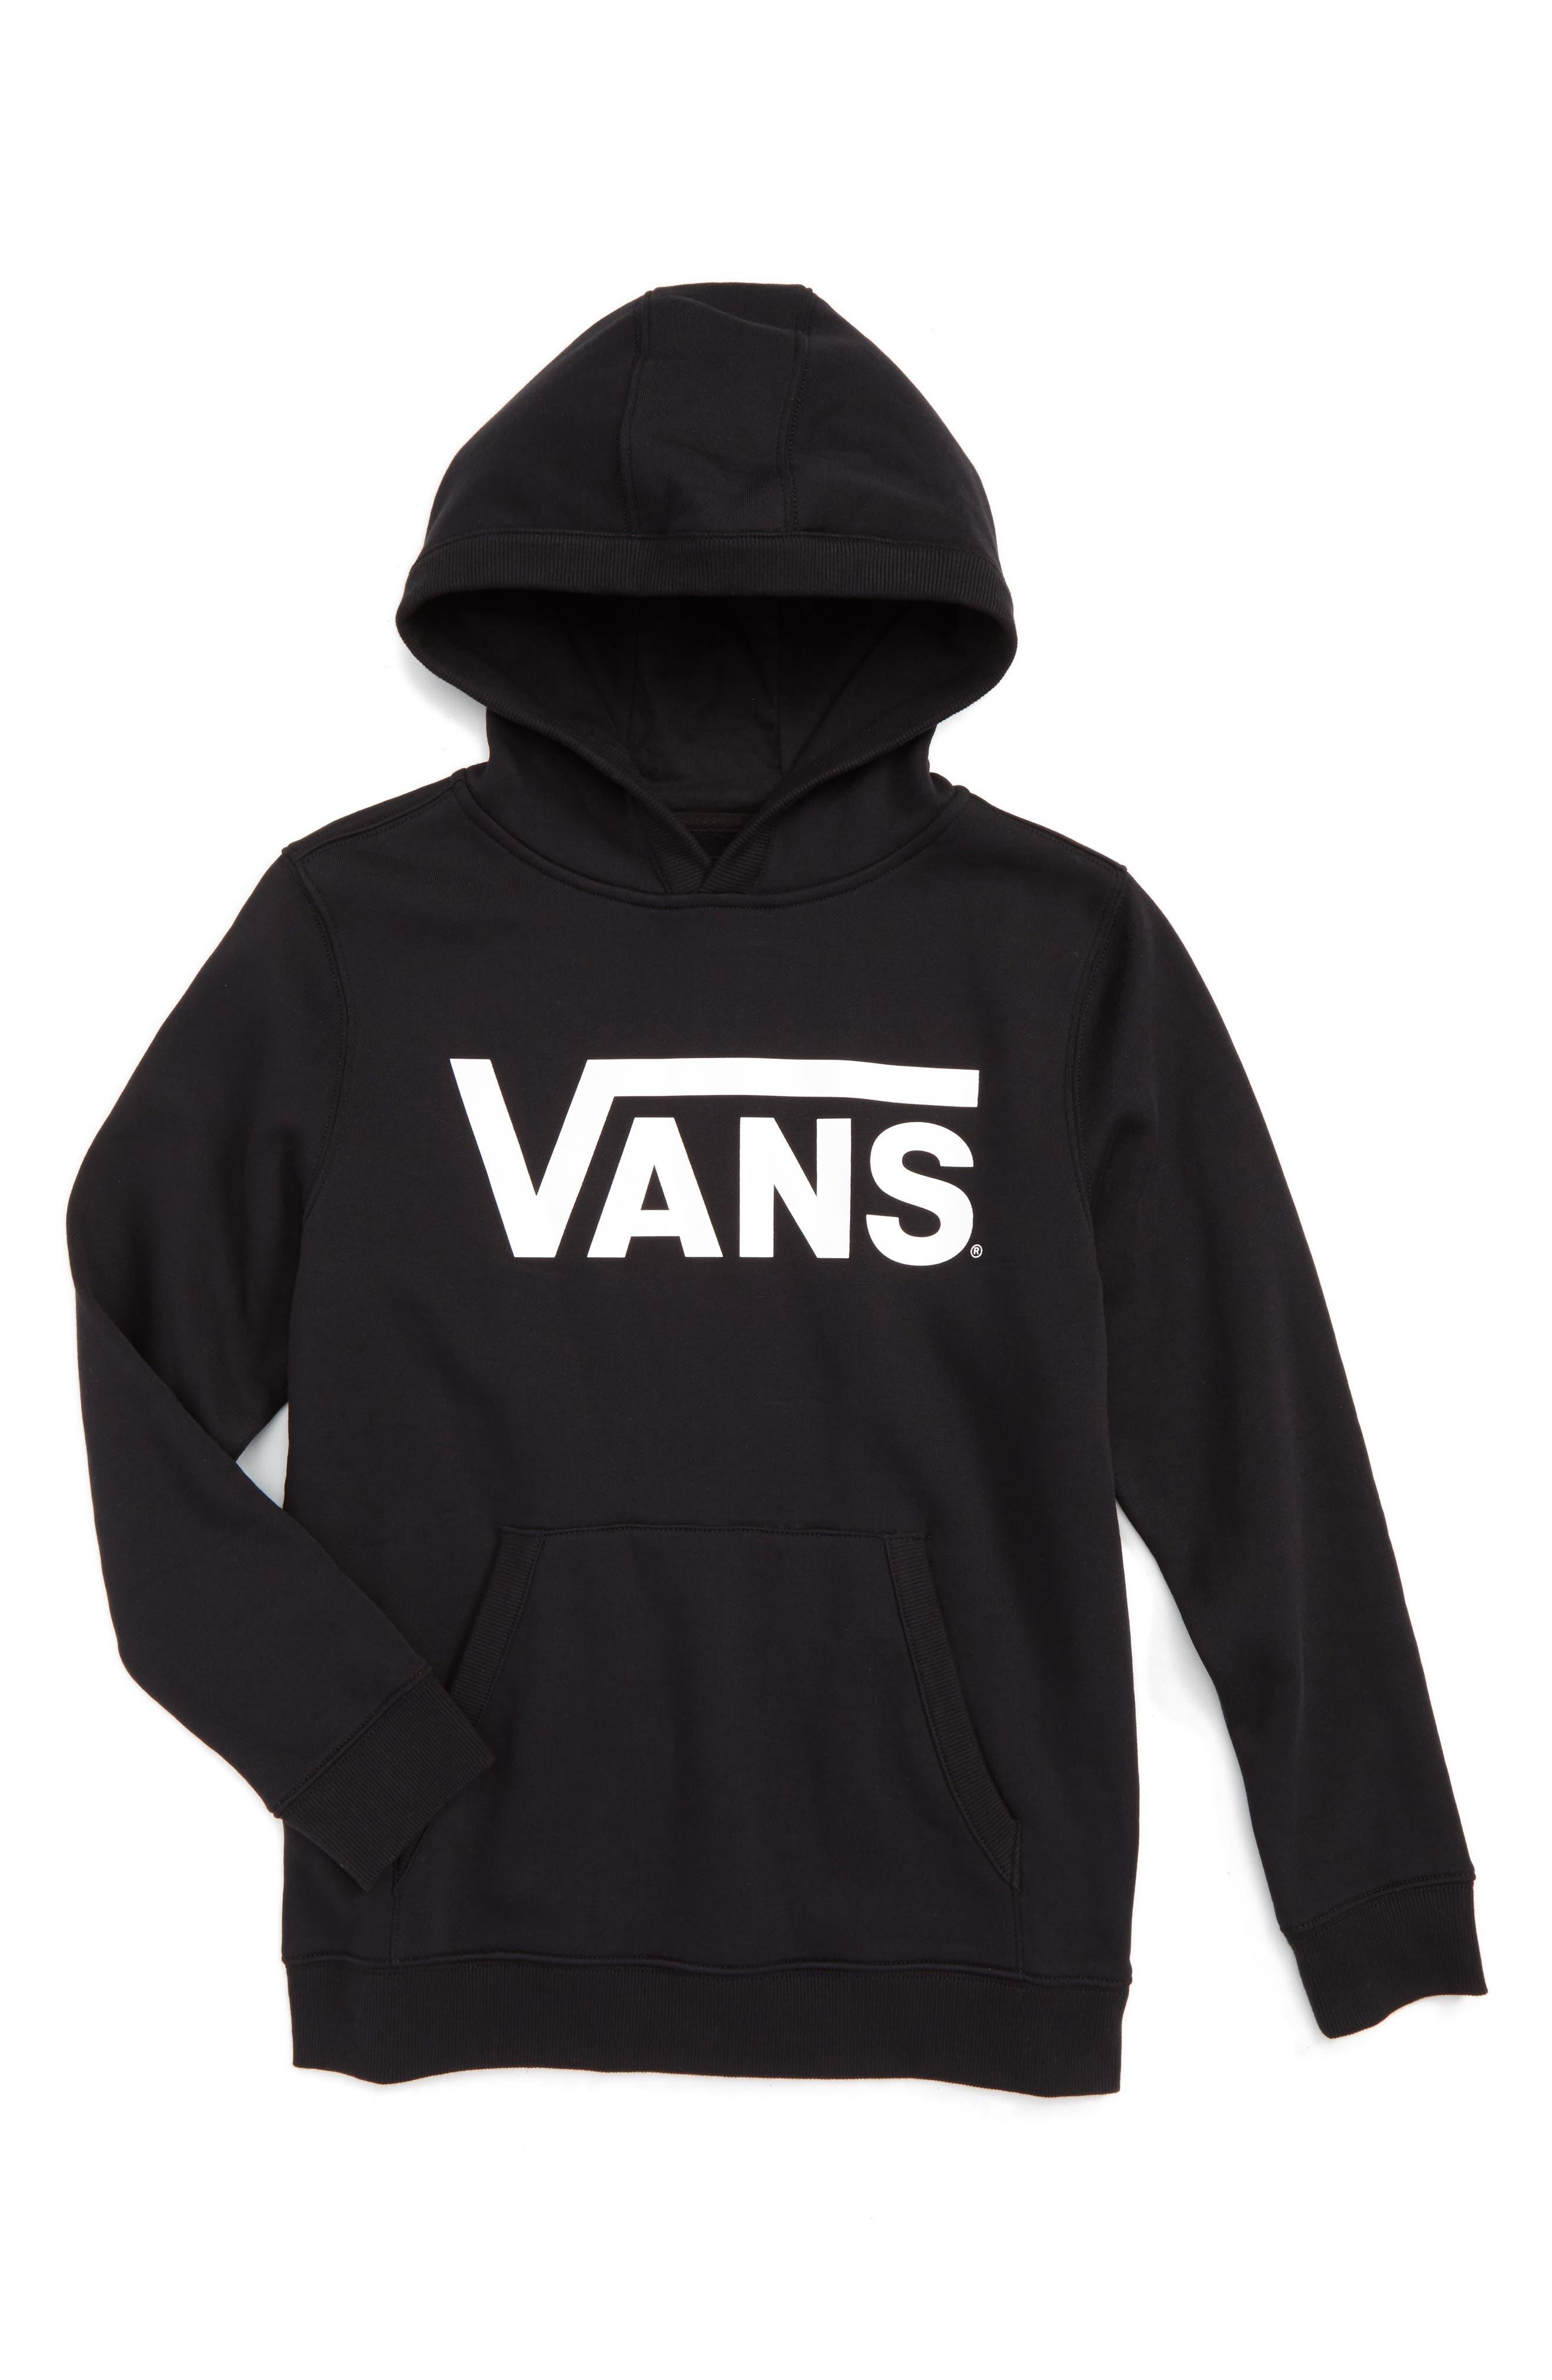 Vans Classic Graphic Hoodie (Big Boys)